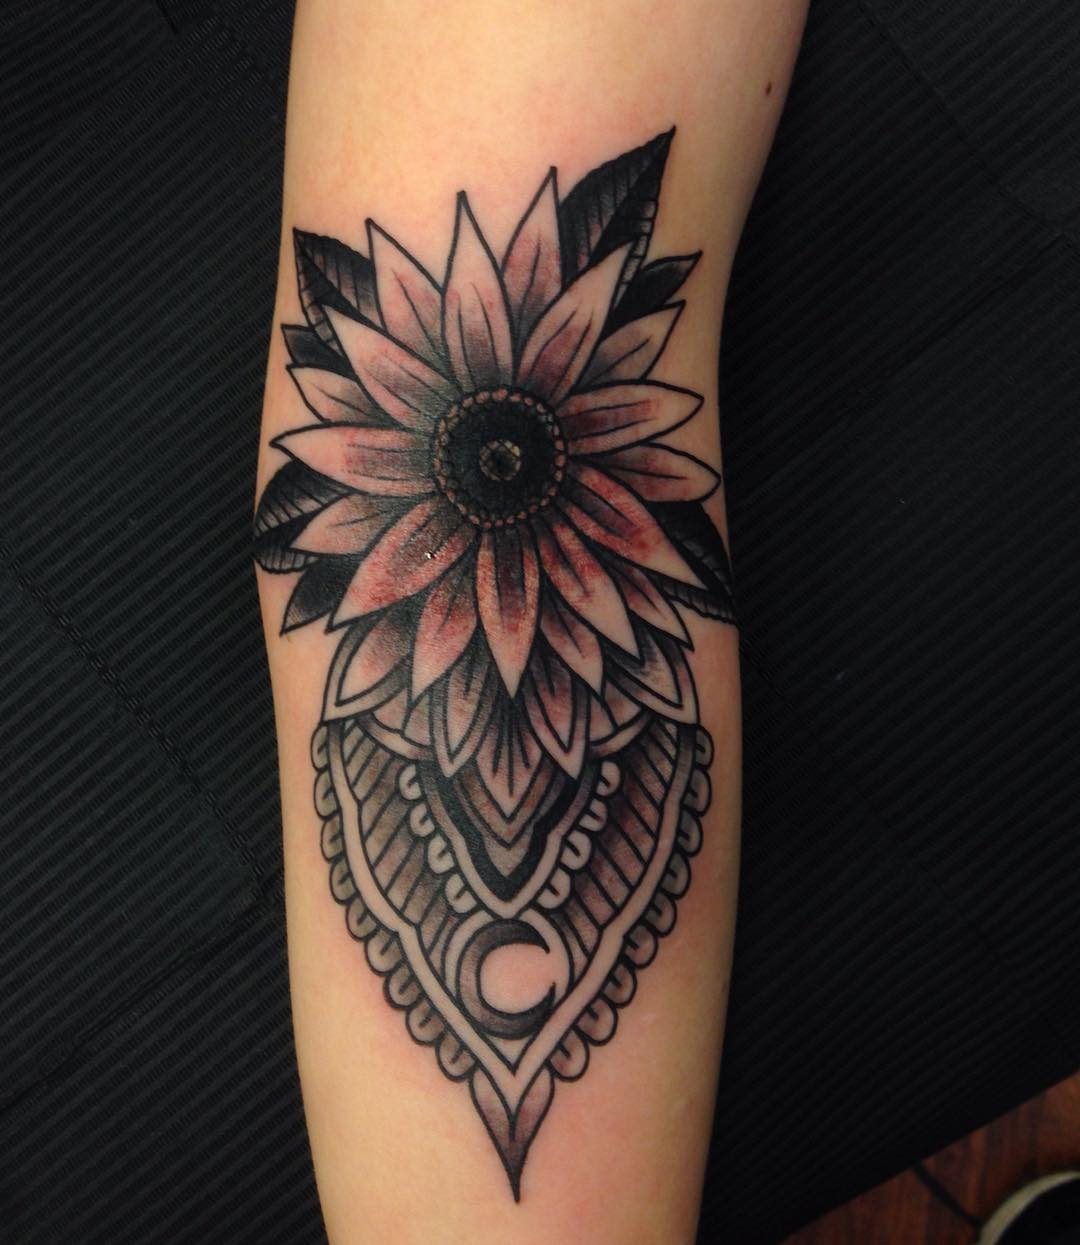 Traditional Tattoo of sunflower